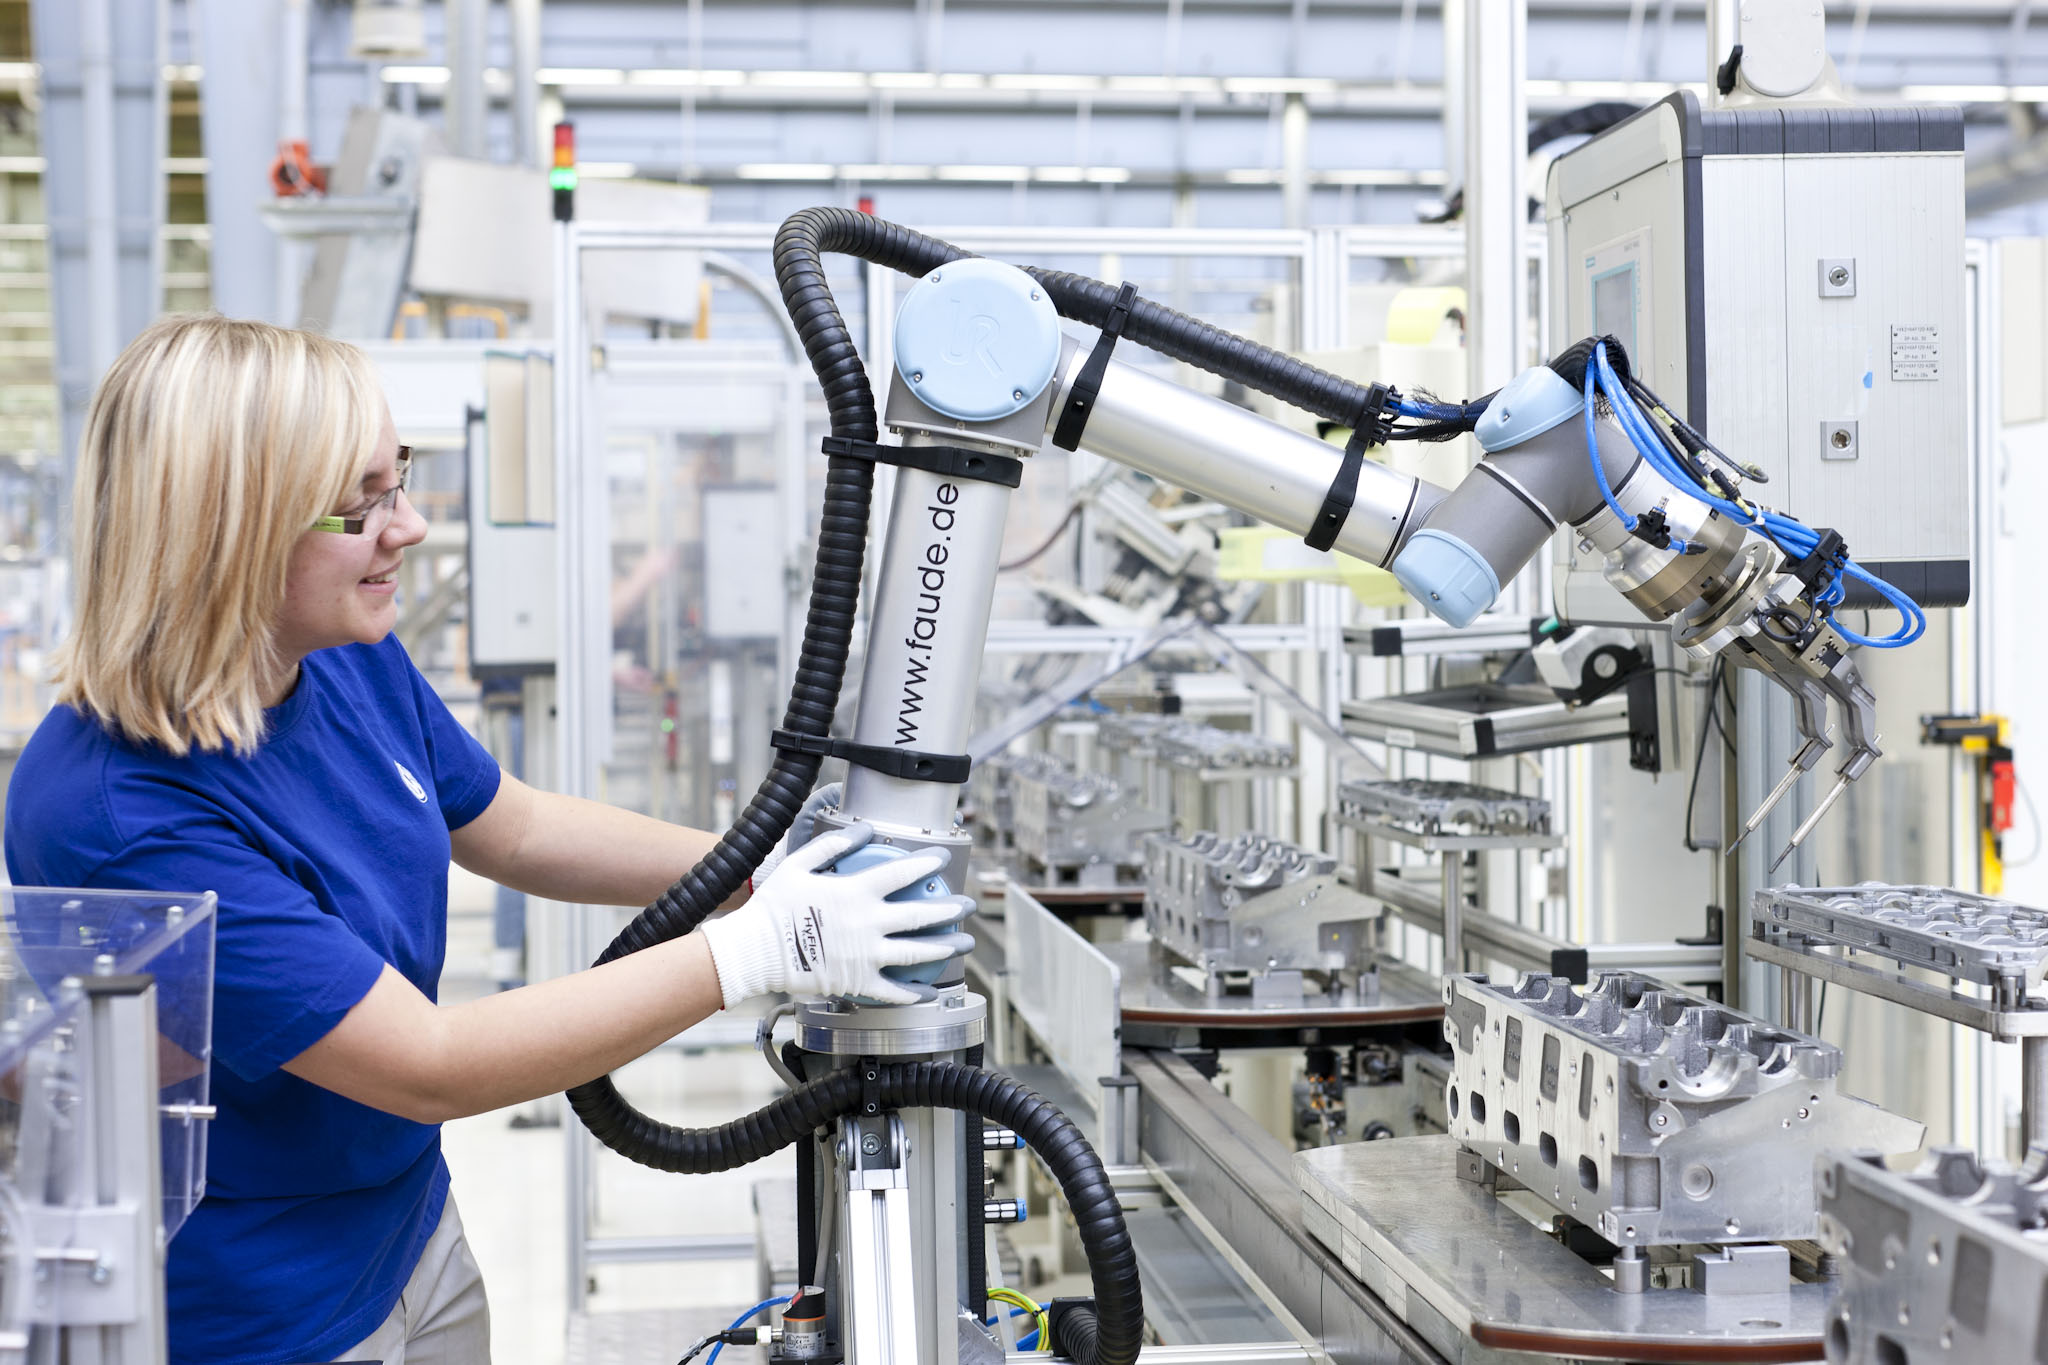 universal-robots-collaborative-robots.jpg